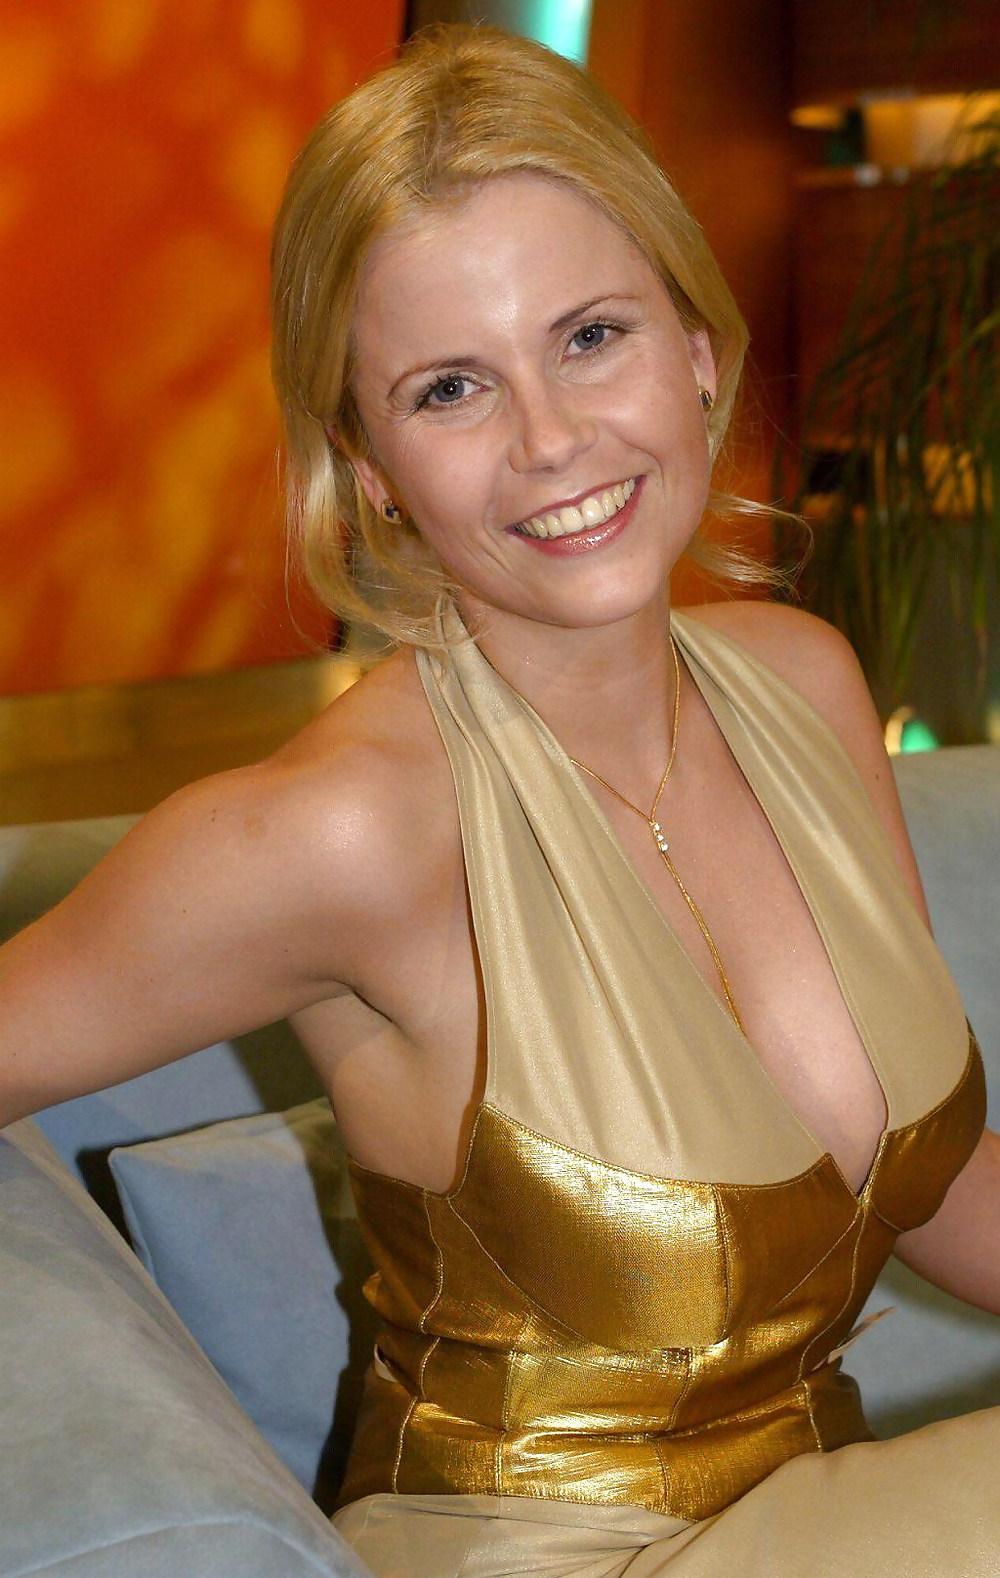 German amateur pornstars